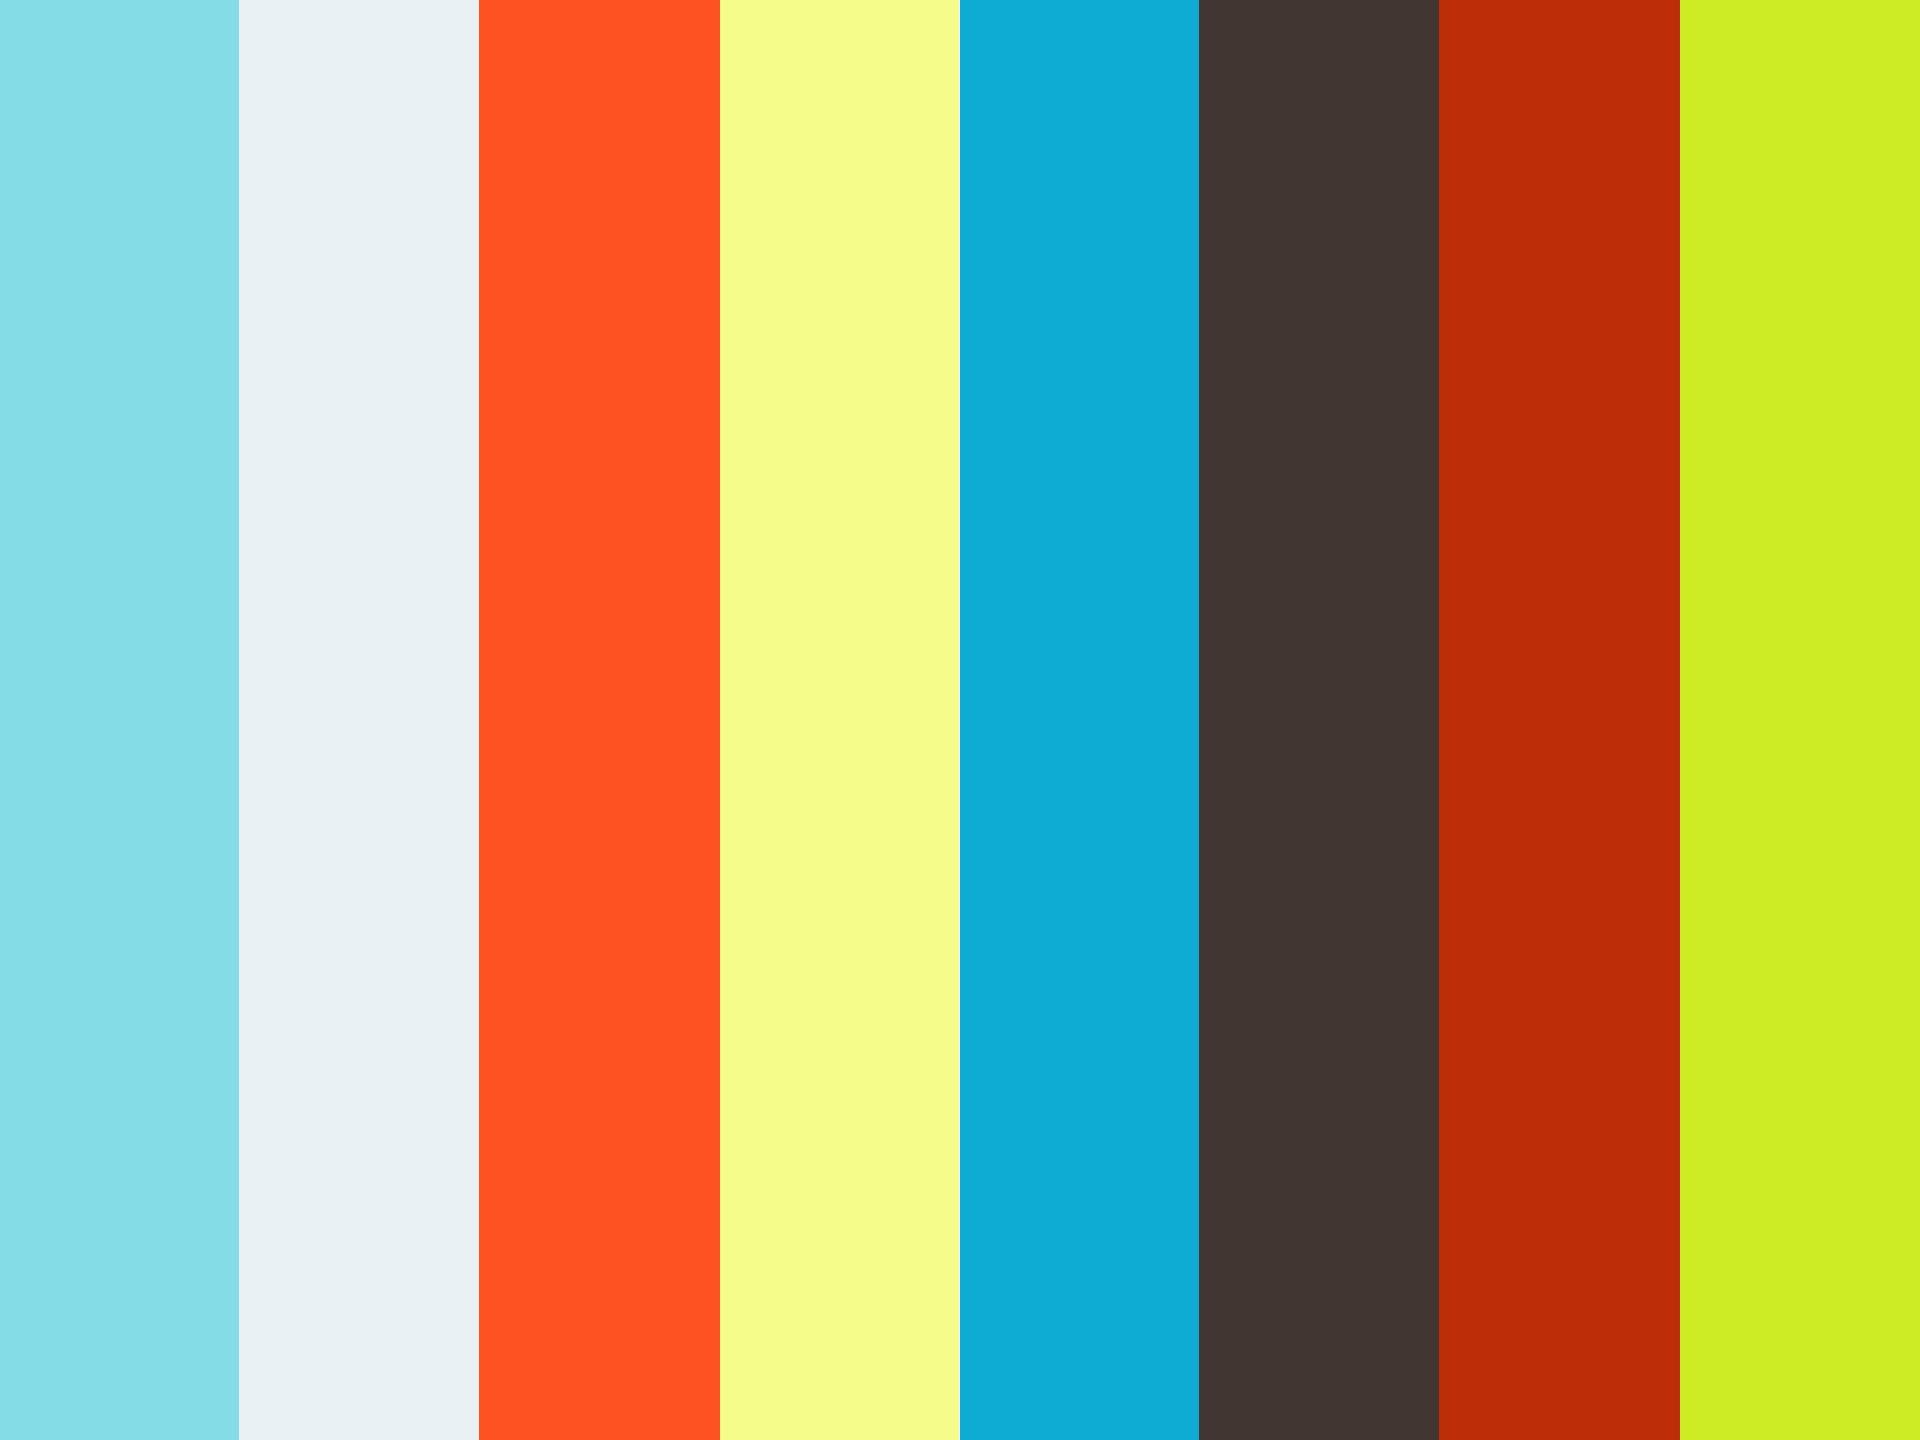 Overlay?src0=https%3a%2f%2fi.vimeocdn.com%2fvideo%2f438928225 1280x720.jpg&src1=https%3a%2f%2ff.vimeocdn.com%2fimages v6%2fshare%2fplay icon overlay